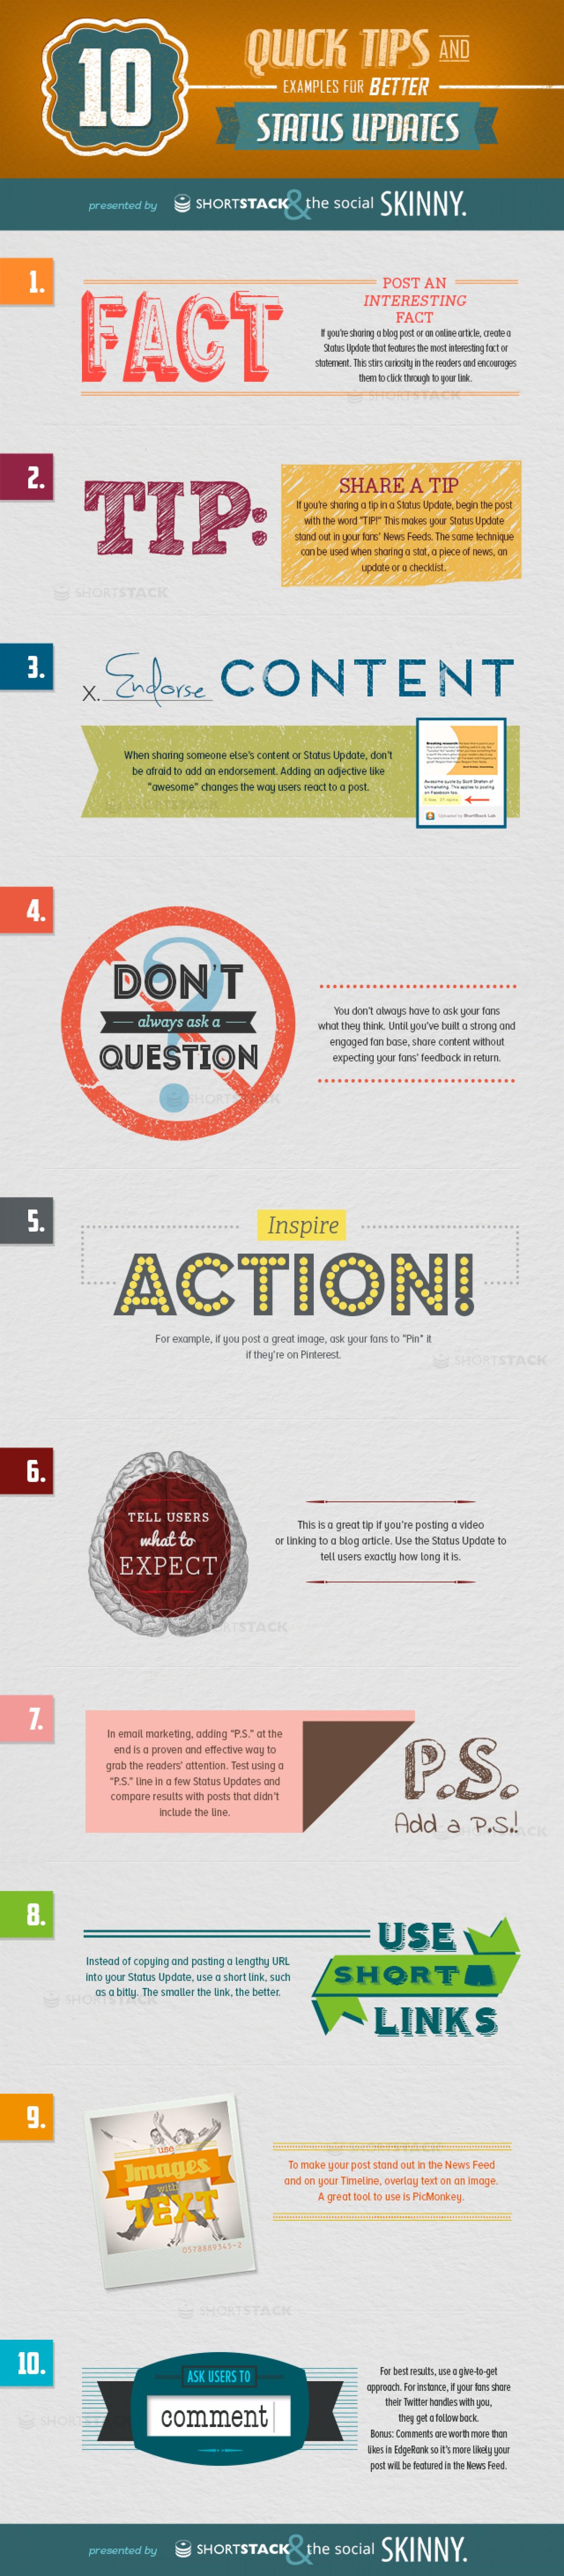 10 Quick Tips for Better Social Media Updates - #Infographic #socialmedia